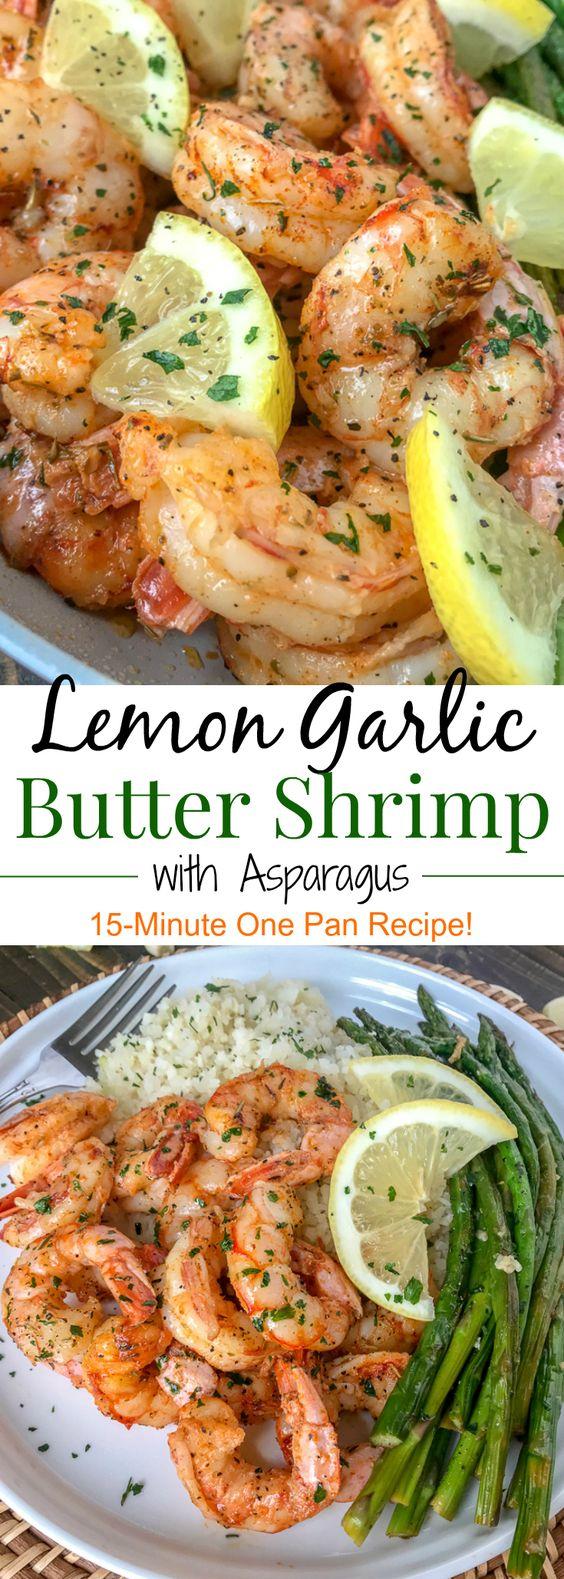 Quick Easy Lemon Garlic Butter Shrimp with Asparagus